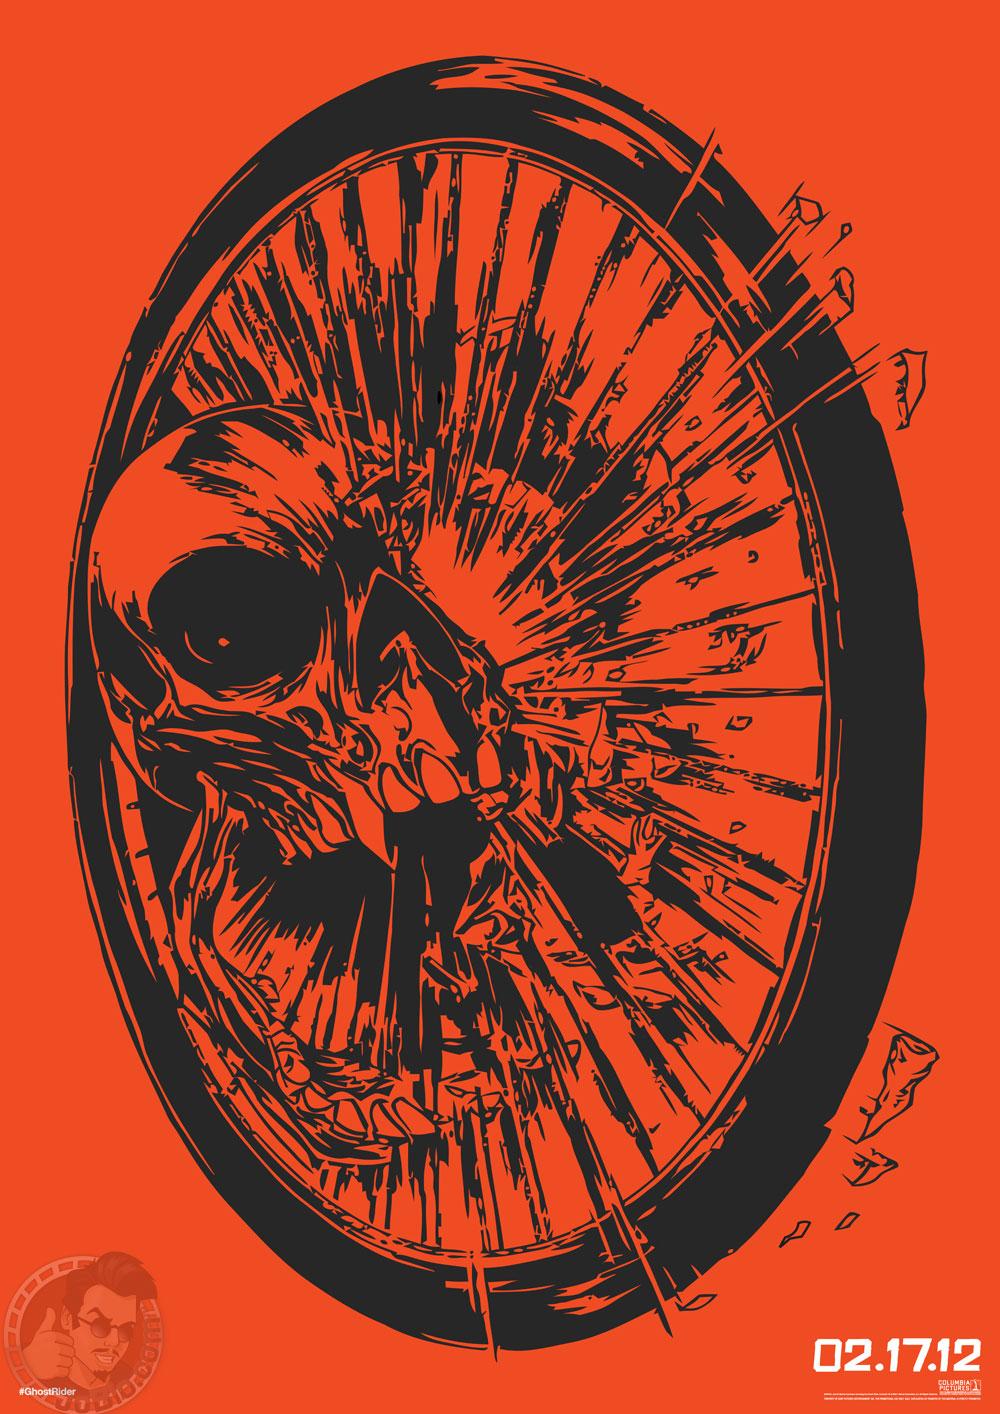 http://collider.com/wp-content/uploads/ghost-rider-spirit-of-vengeance-poster-art-2.jpg